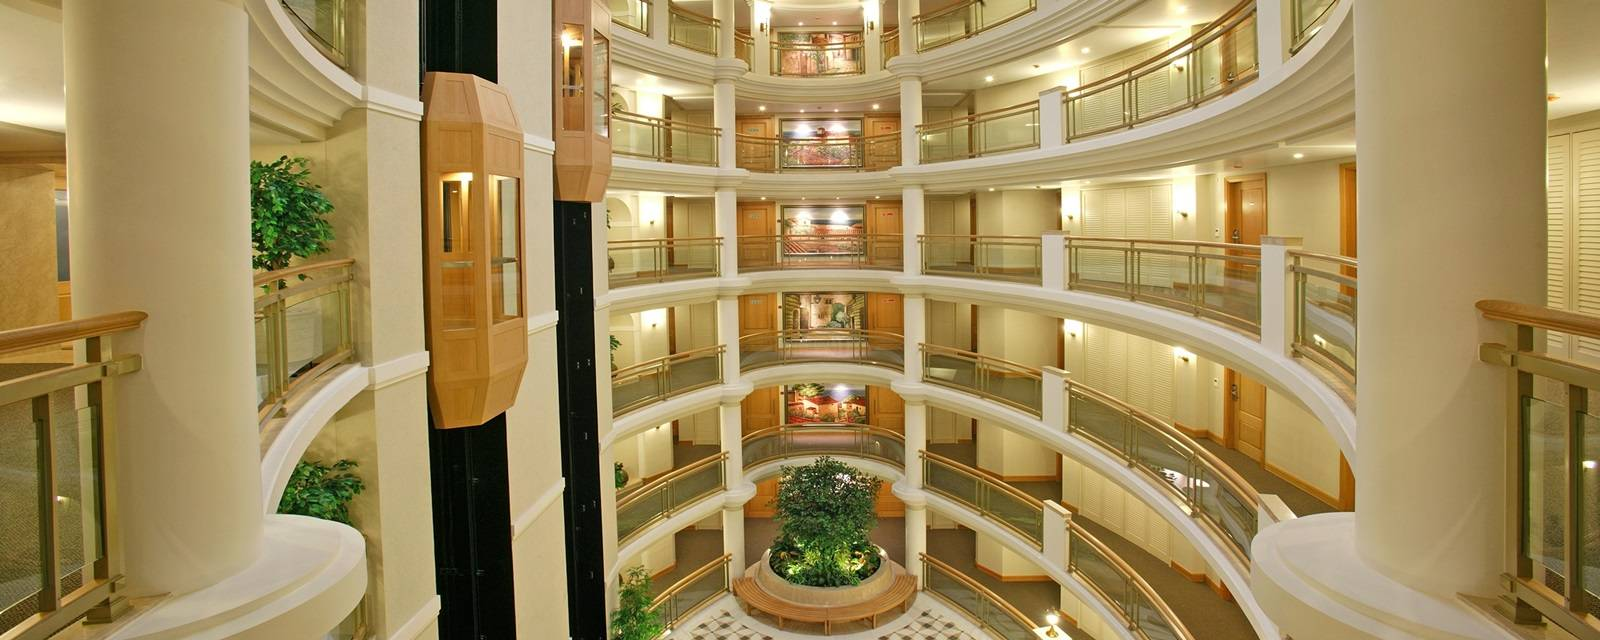 Imperialhotelrajkotimperialinterior.jpg